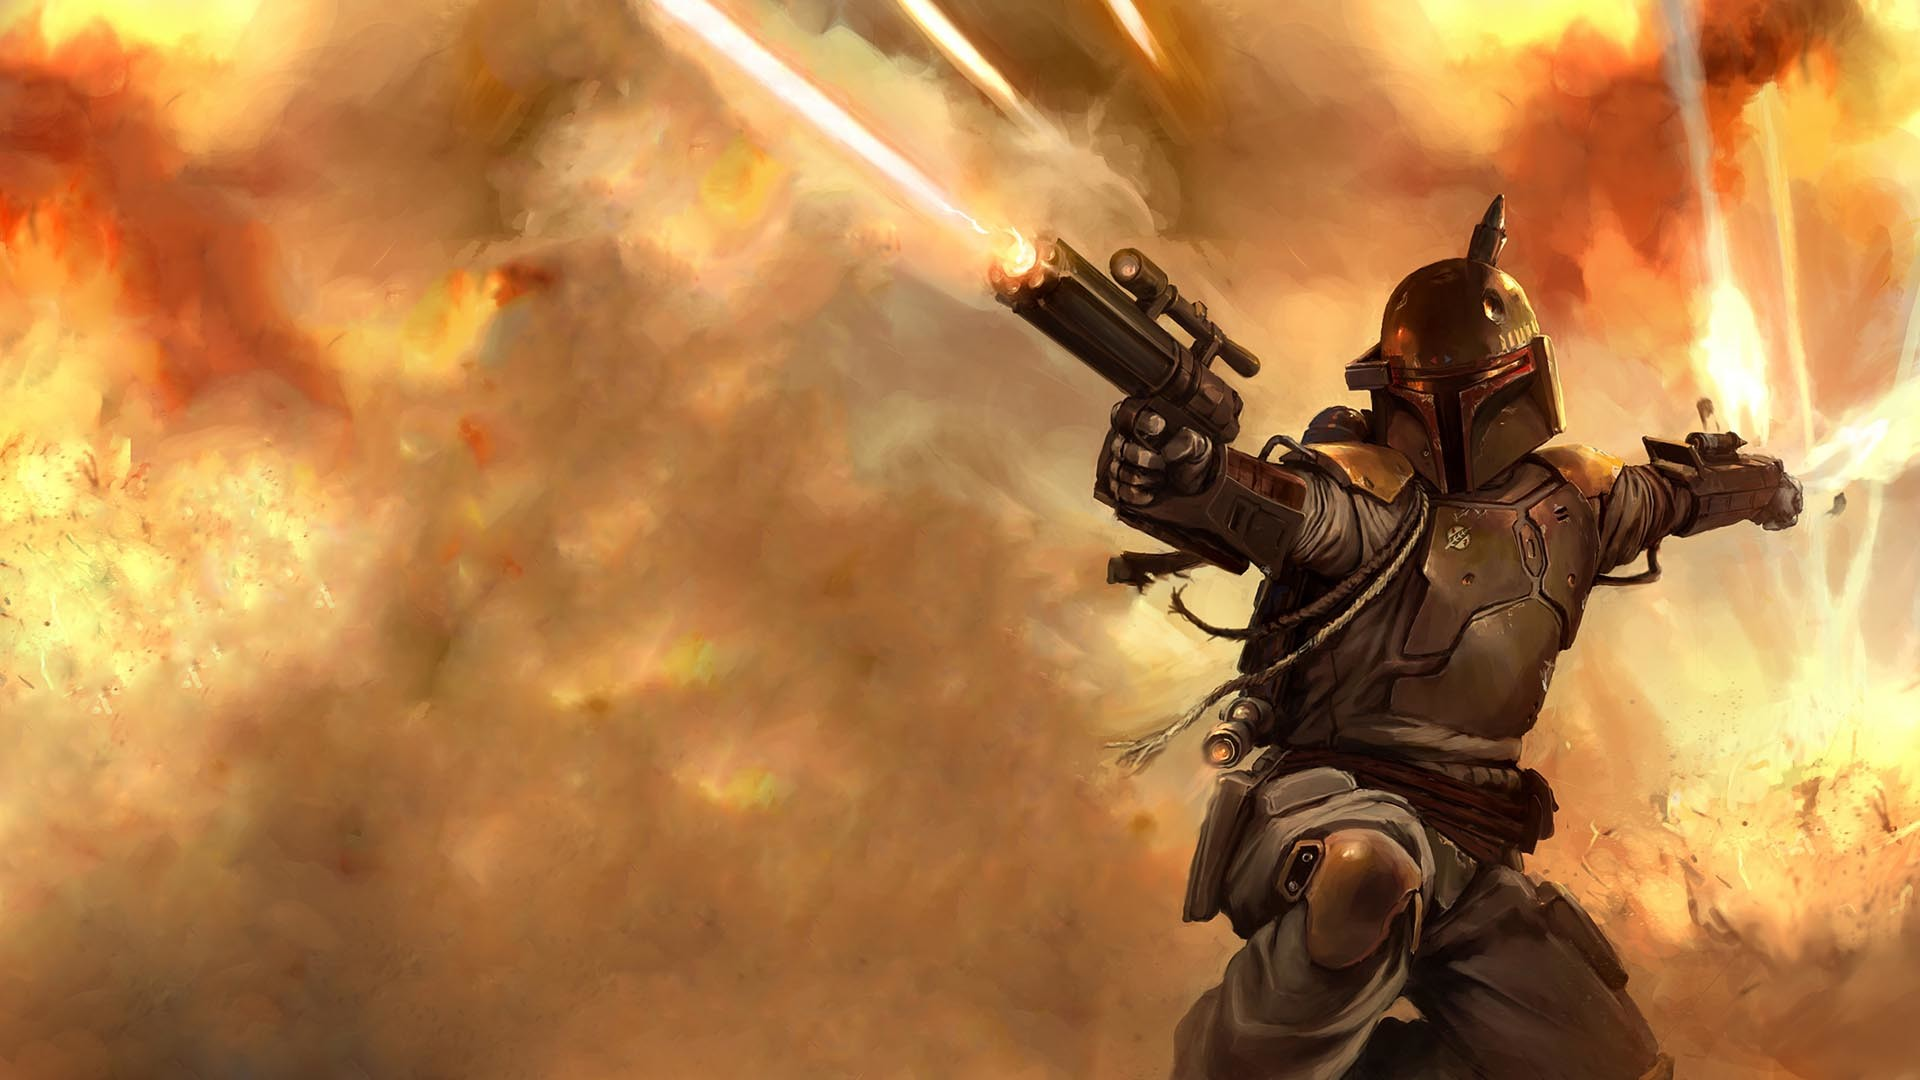 Star Wars HD Wallpapers Backgrounds Wallpaper